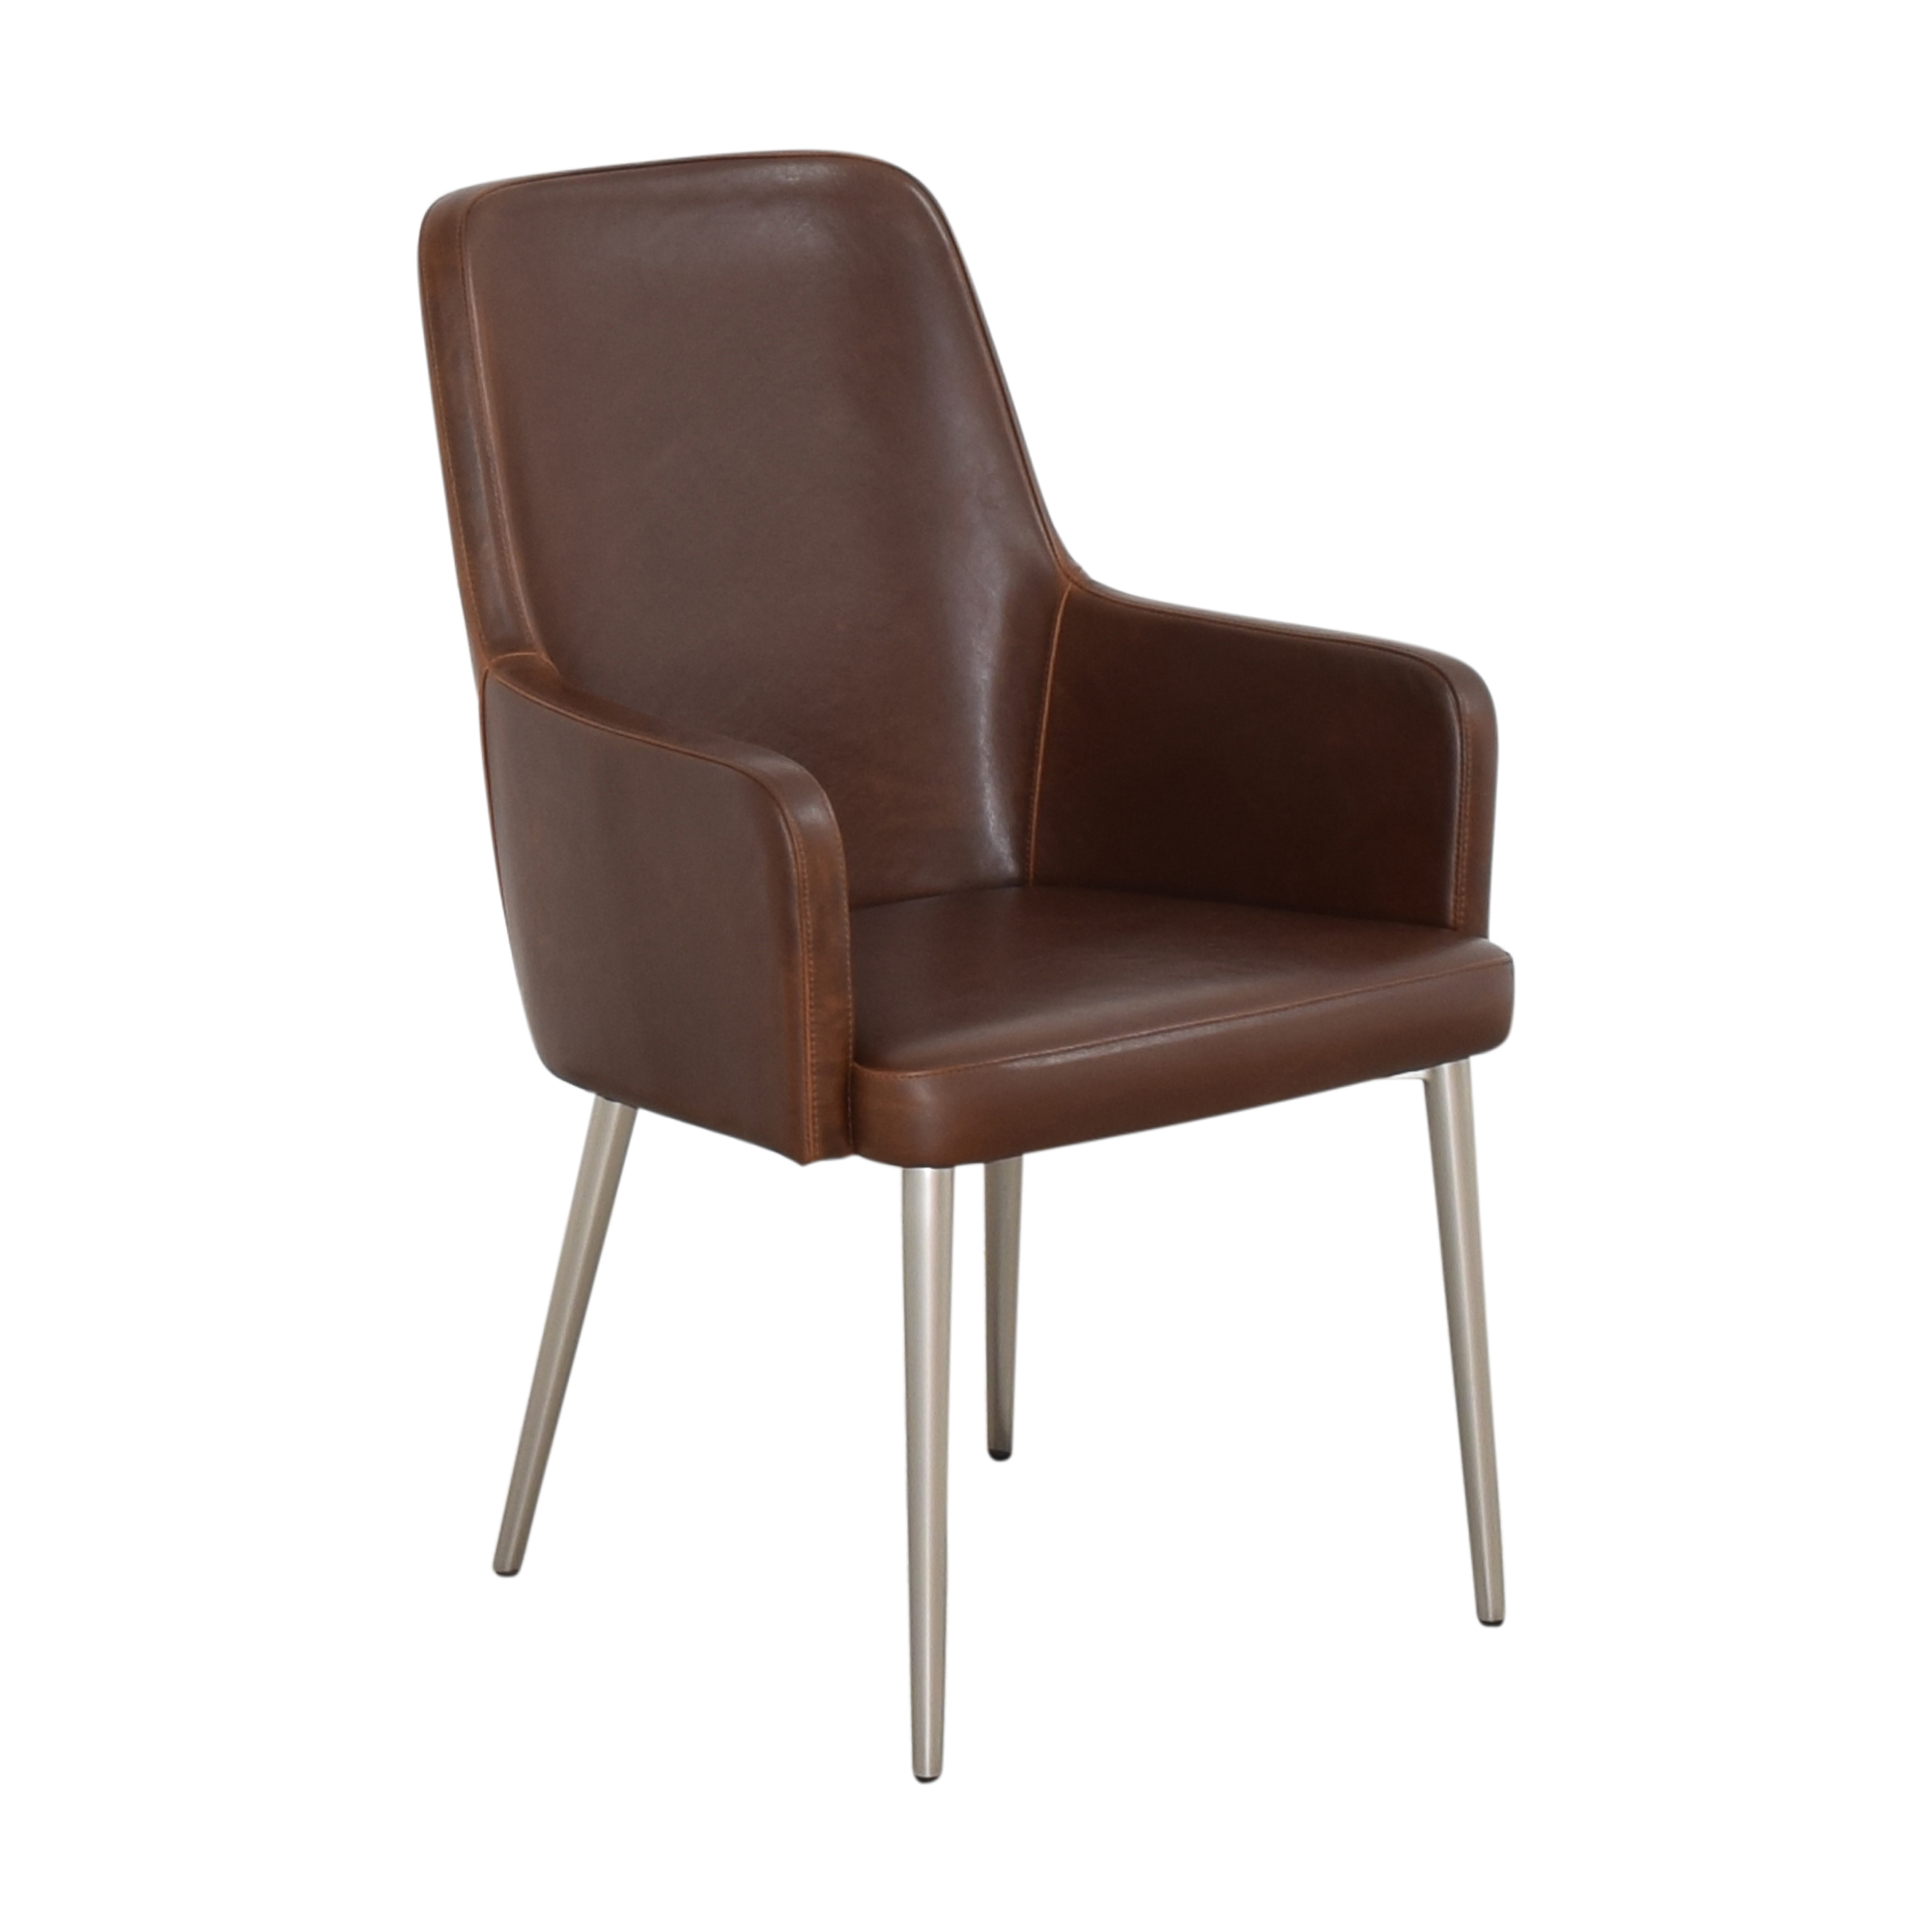 shop CB2 CB2 Aragon Chair online